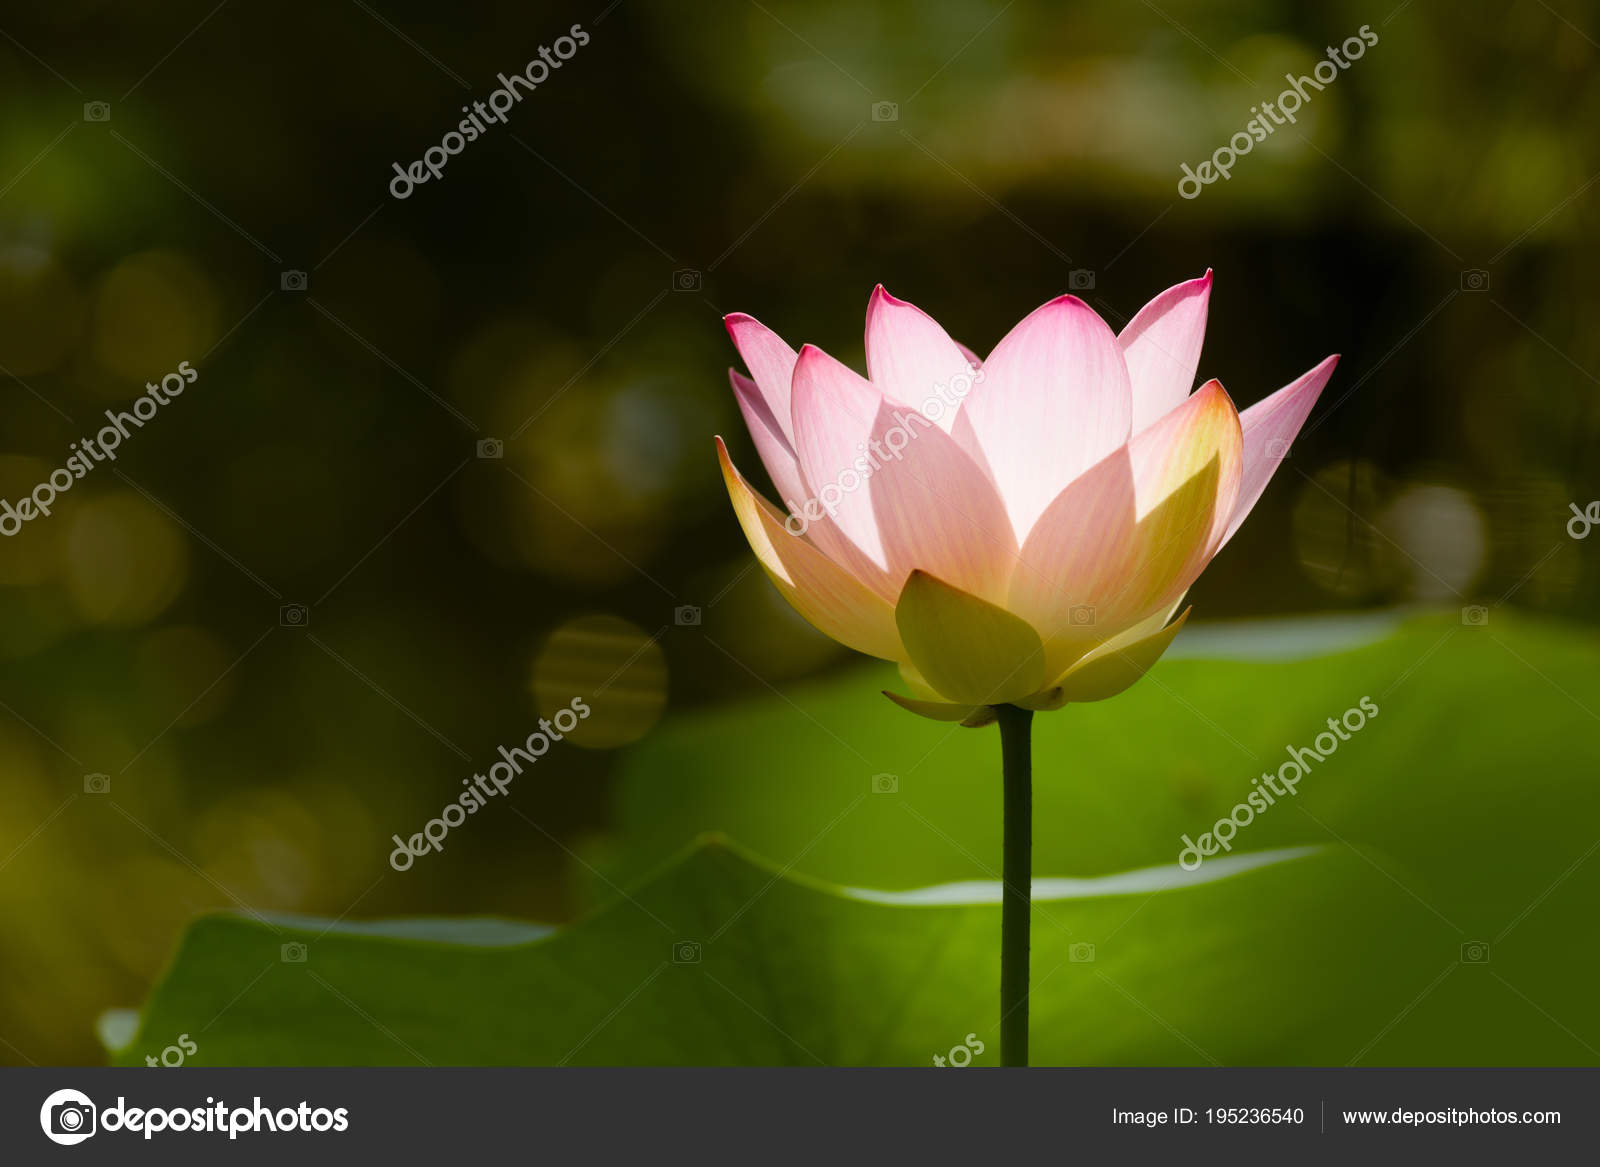 Thin Petals Of A Lotus Flower Stock Photo Klanneke 195236540